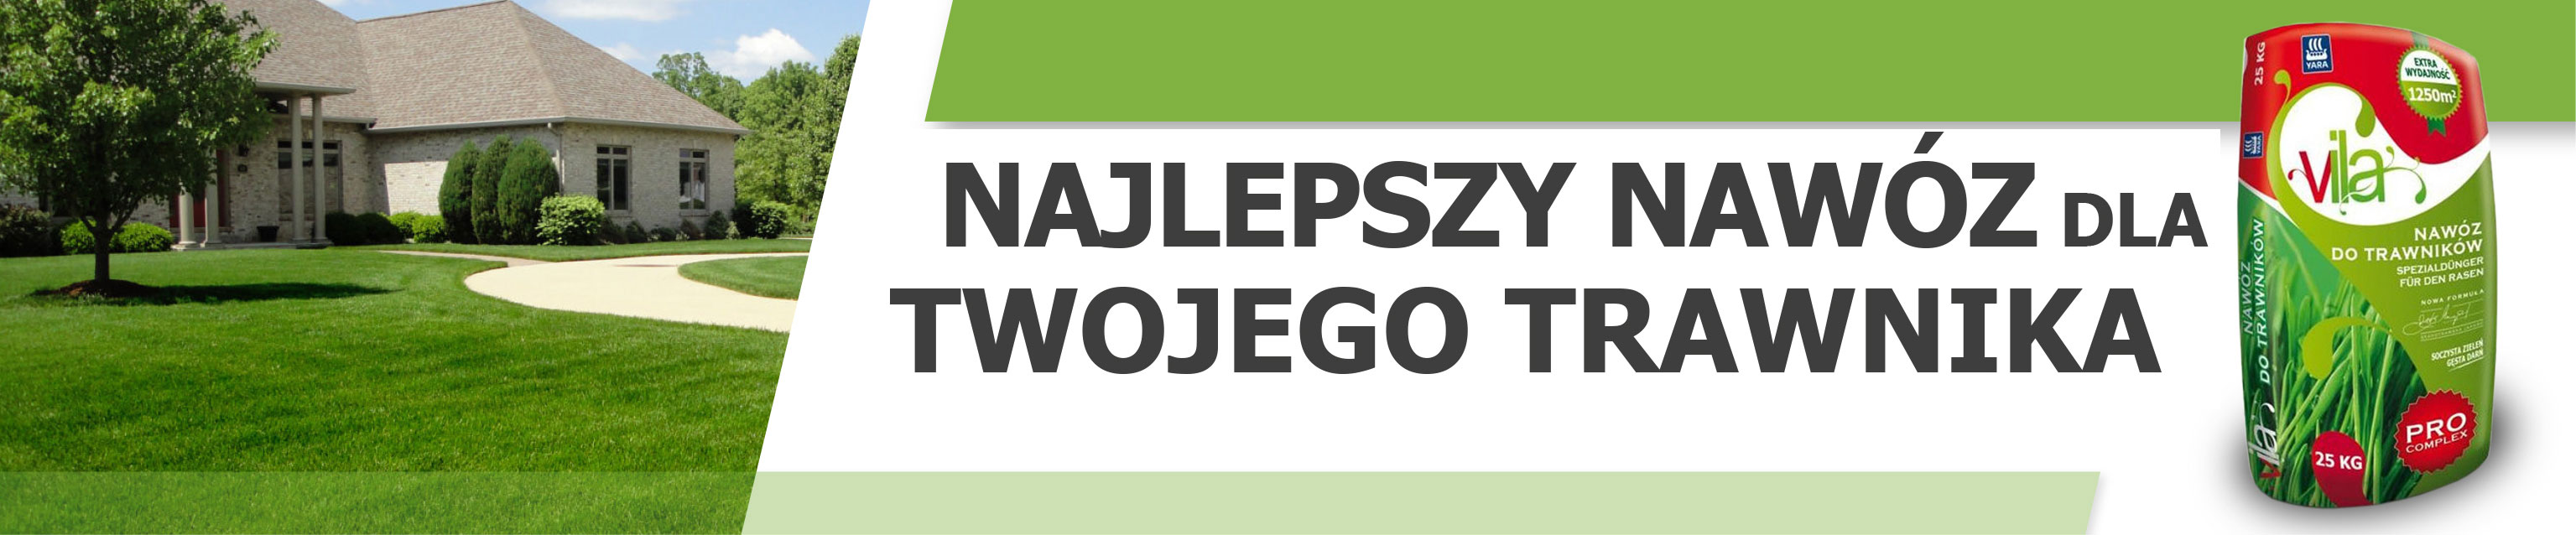 nawoz-2